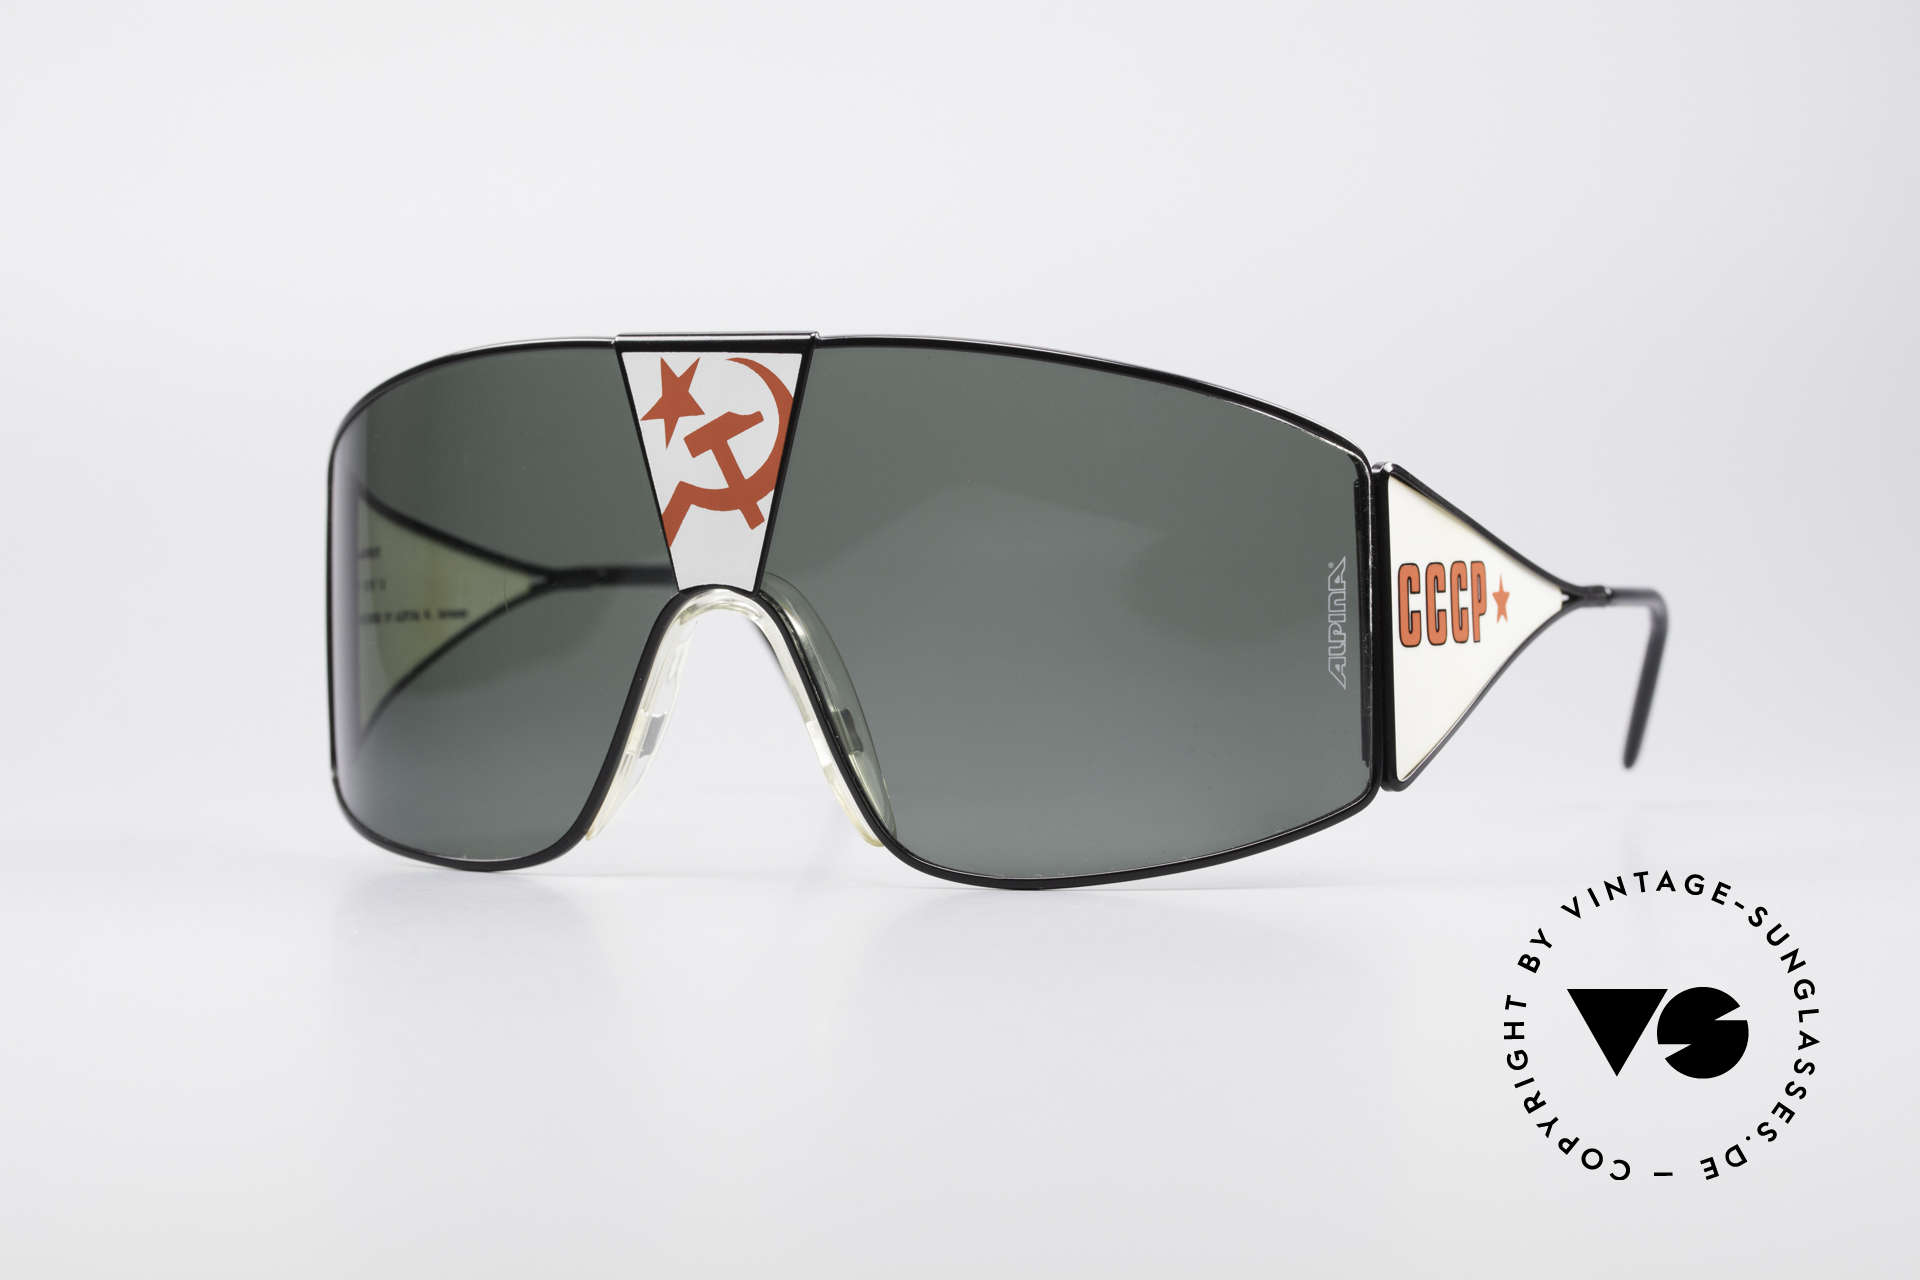 Sunglasses Alpina Talking Glasses Glasnost Gorbatschow